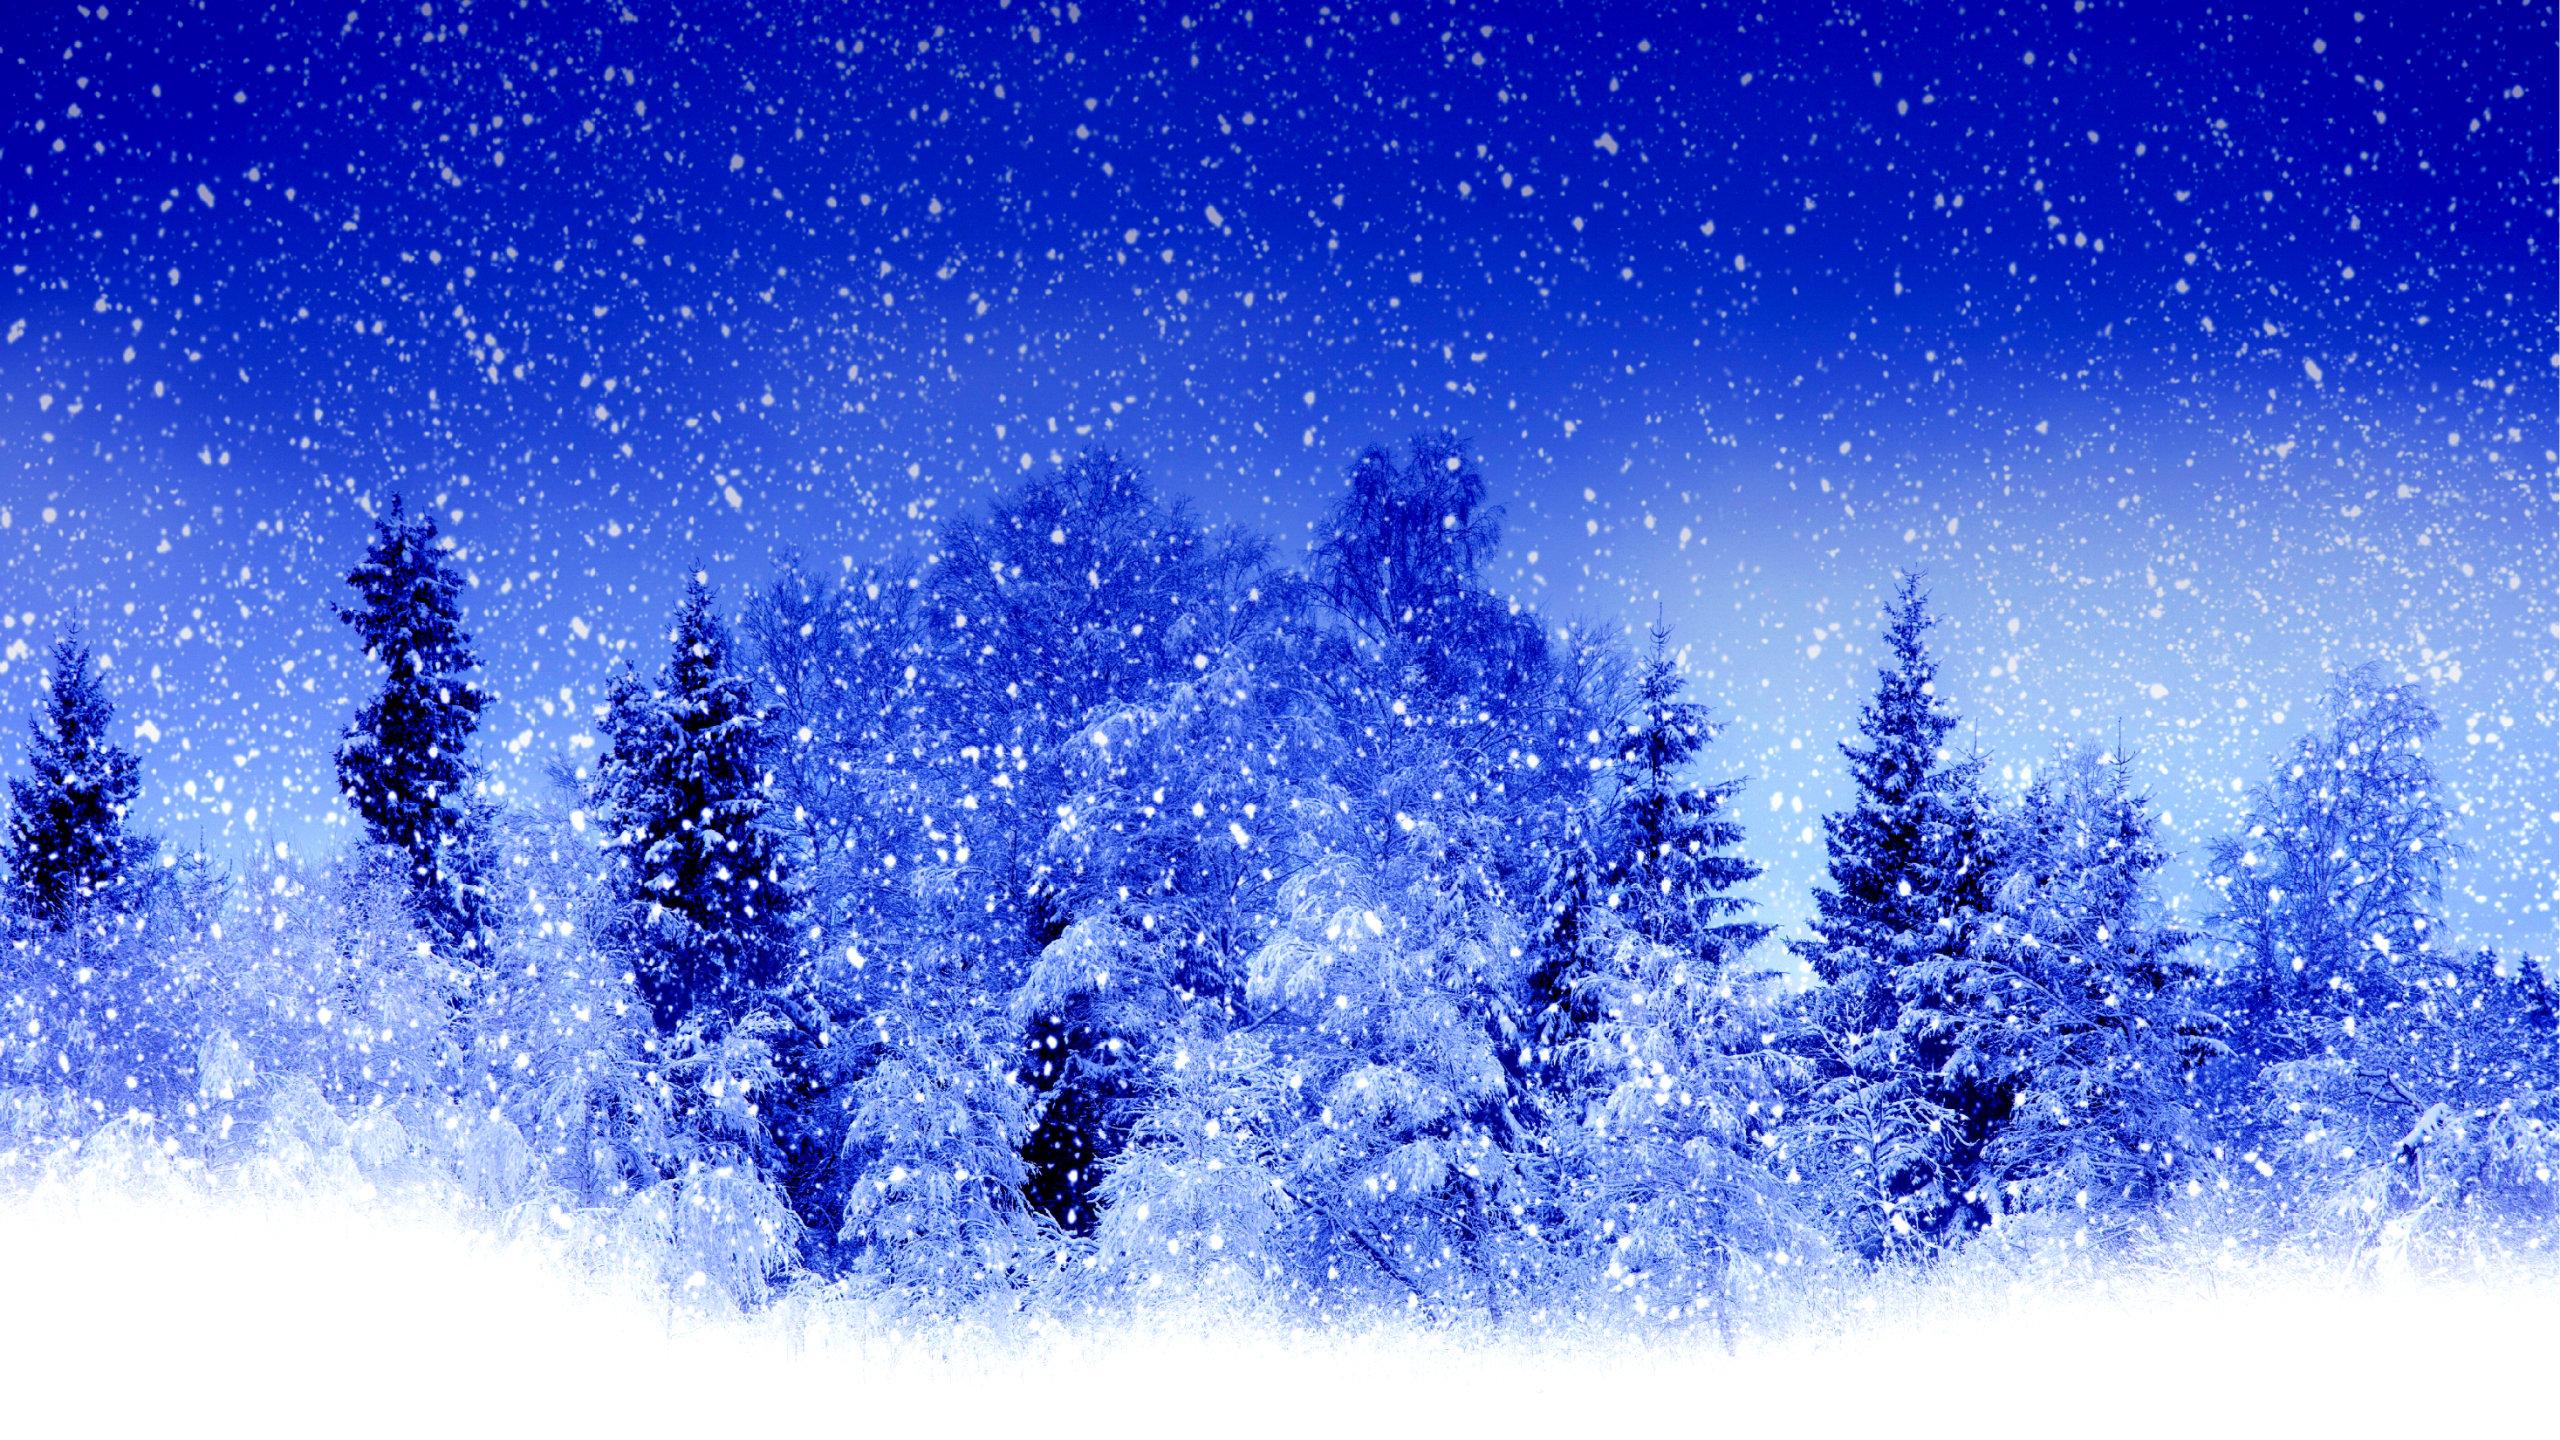 Winter Wallpapers HD For Desktop Backgrounds